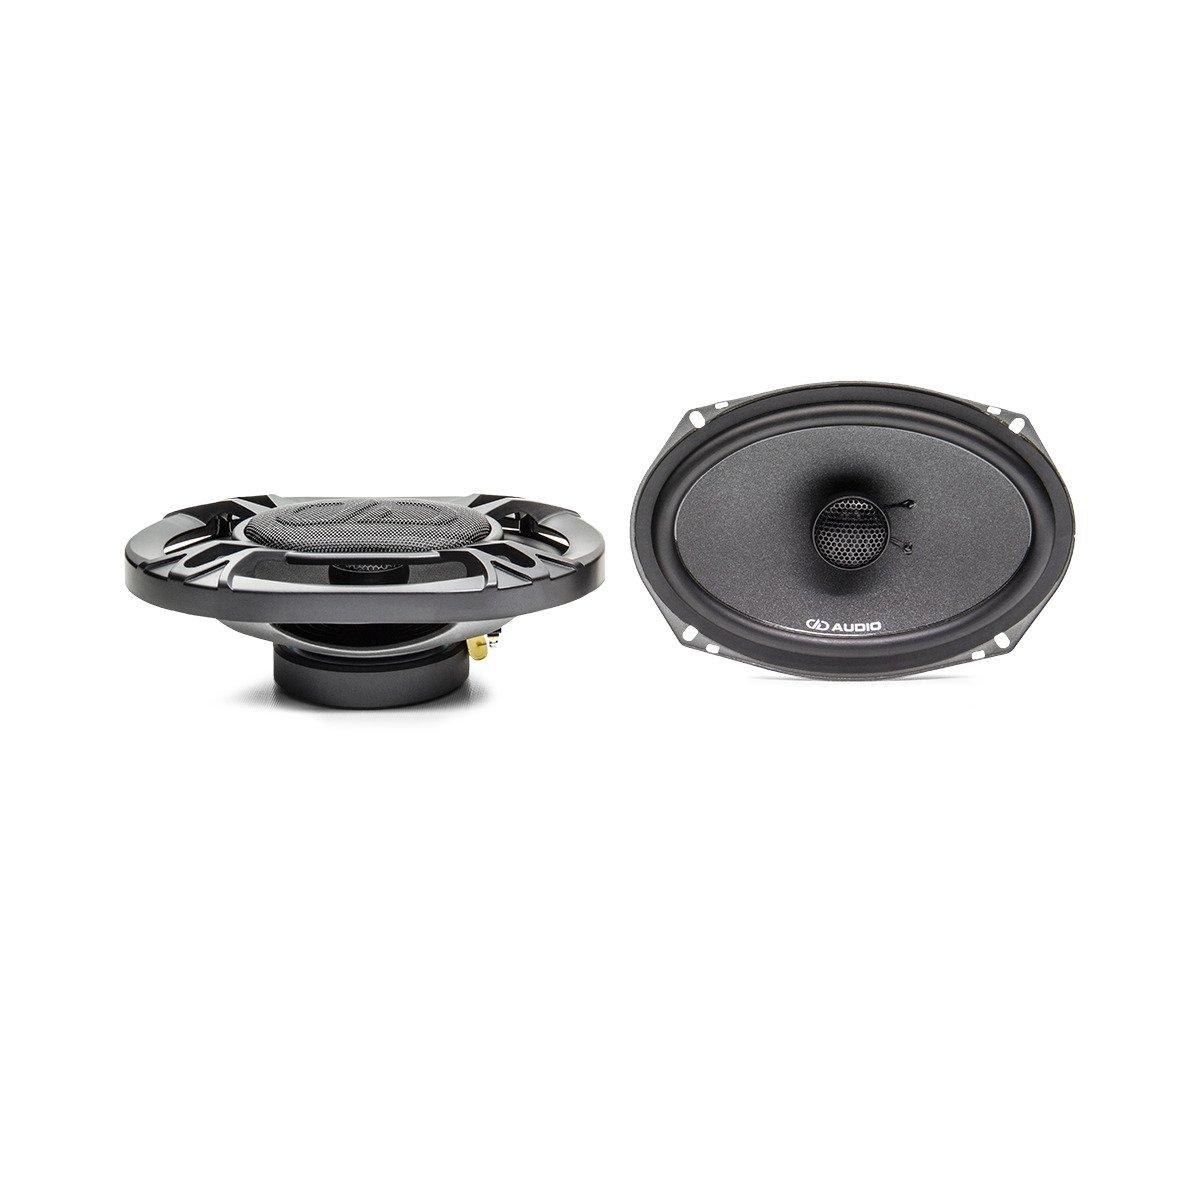 "DD Audio DX6X9 6x9"" 150W RMS 2 Way Coaxial Car Speakers (pair)"